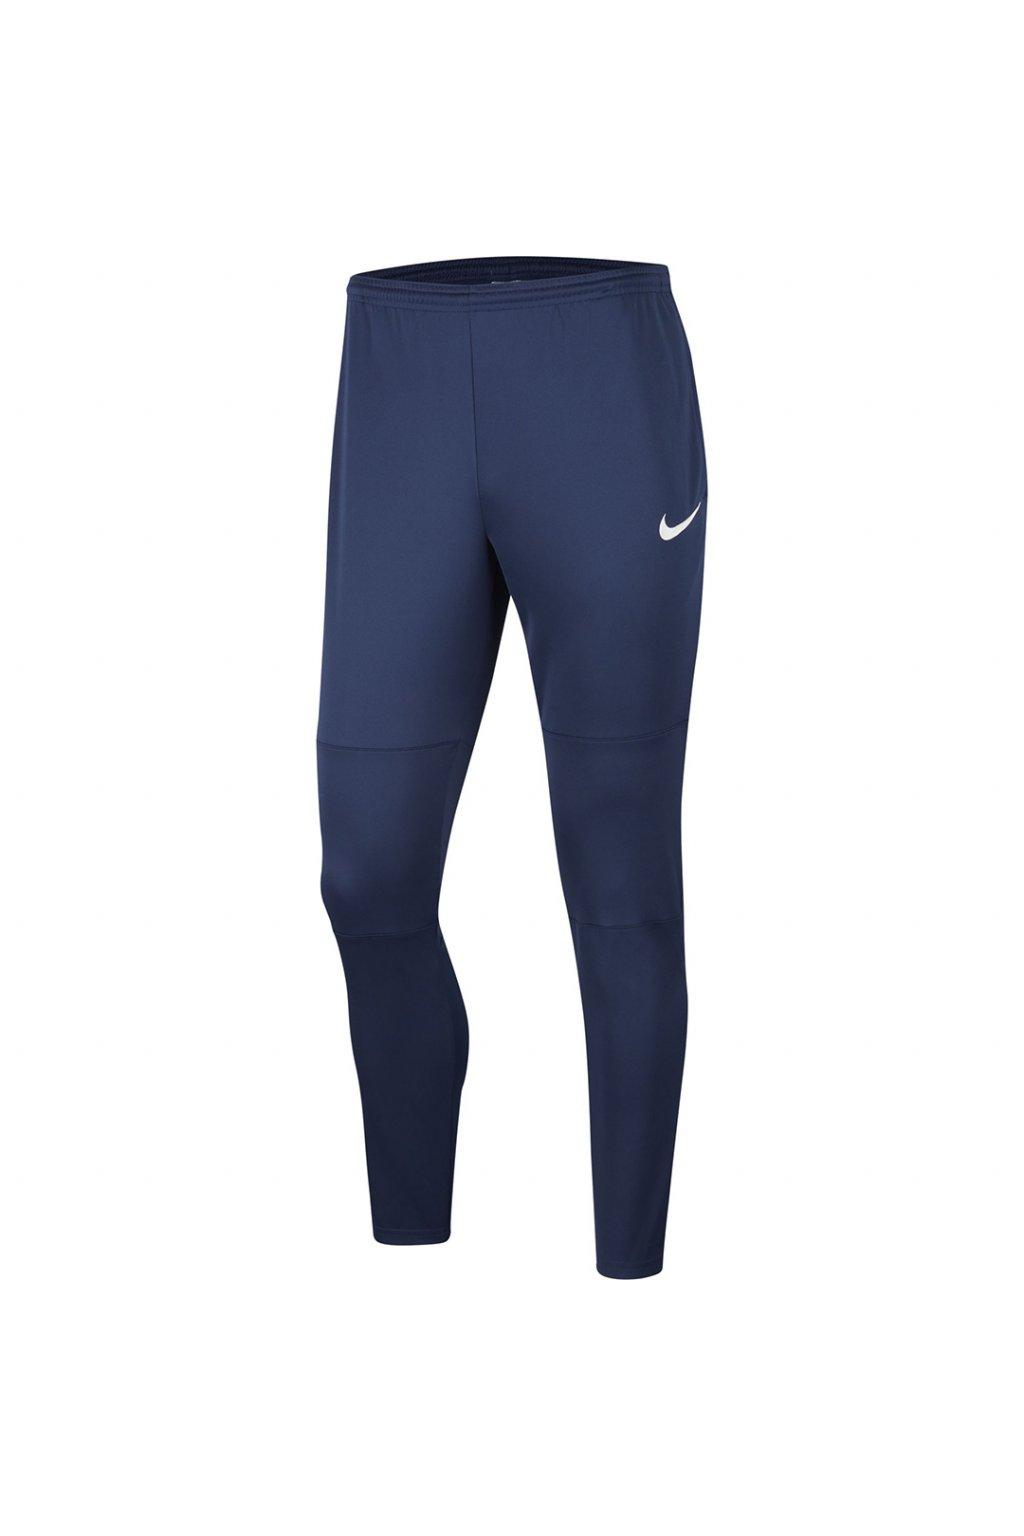 Juniorské tepláky Nike Dry Park 20 Pant KP tmavo modré BV6902 451